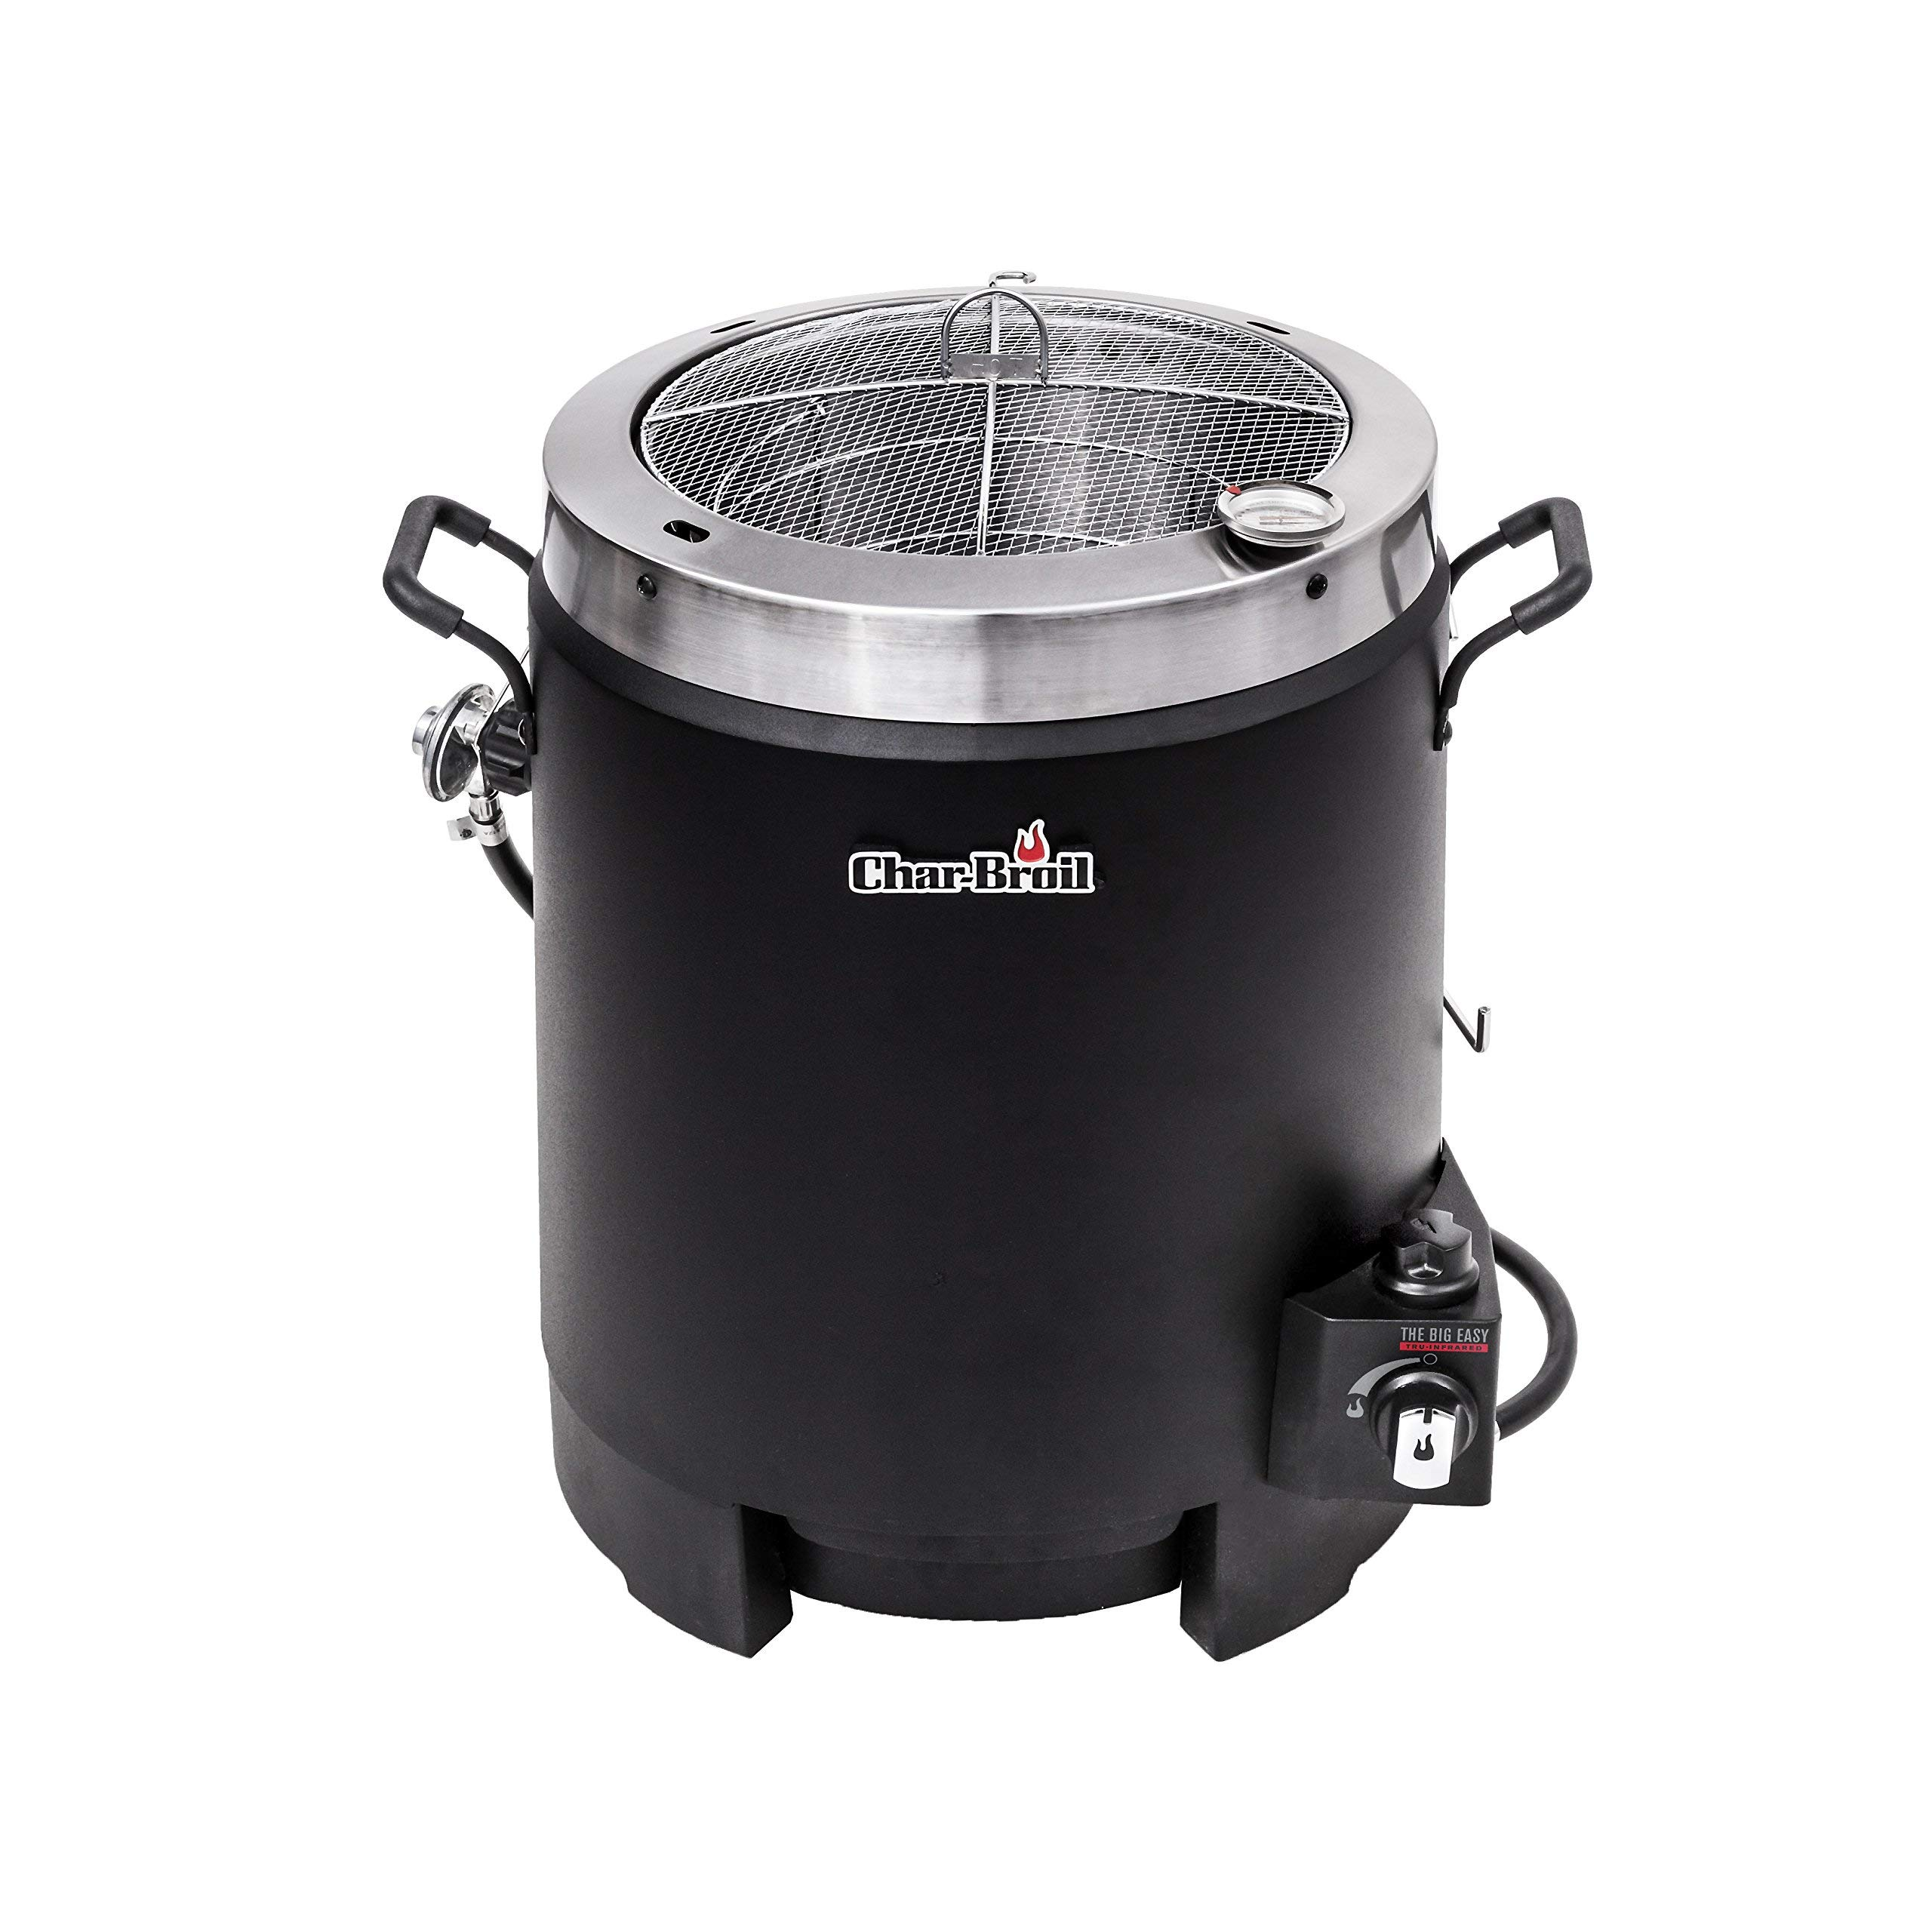 Char-Broil Big Easy Oil-less Liquid Propane Turkey Fryer (Renewed) by Char-Broil